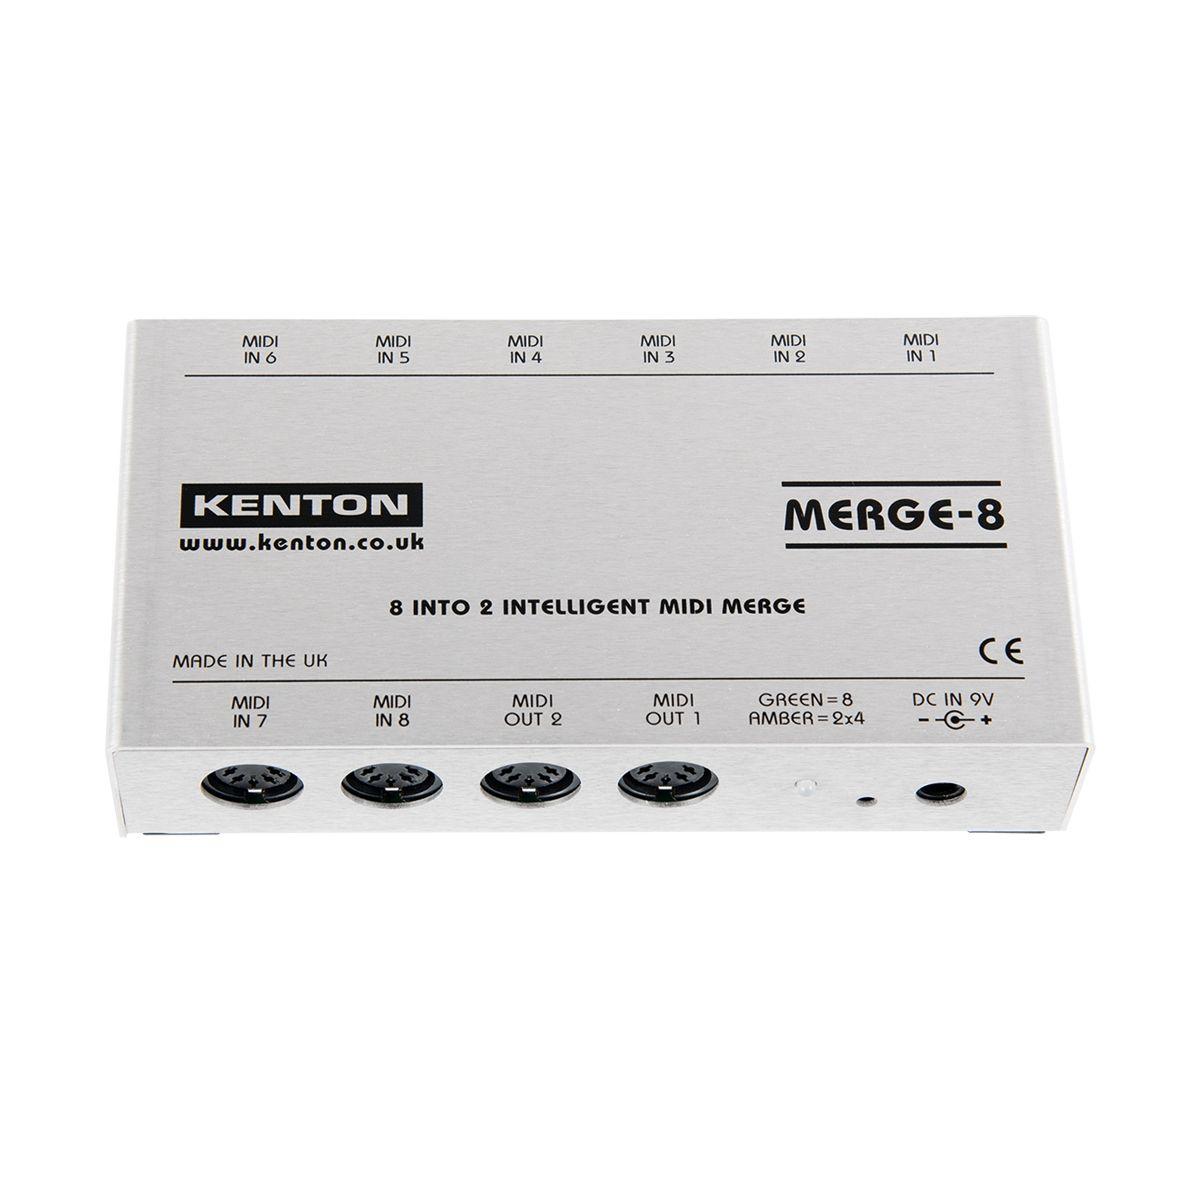 Kenton ElectronicsMERGE 8 MIDI Merge Box